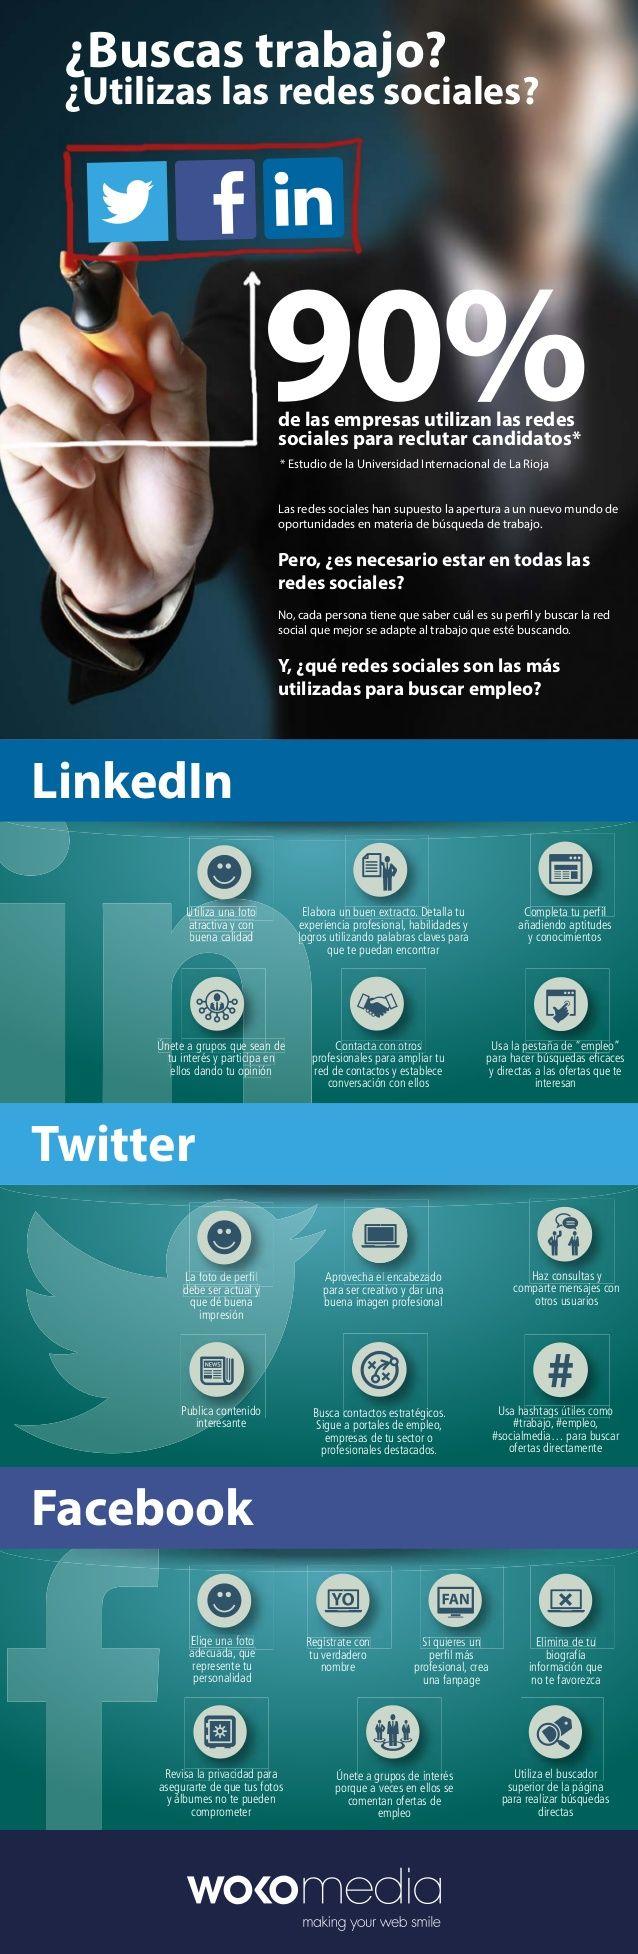 infografia_redes_sociales_para_buscar_empleo.jpg (638×1954)